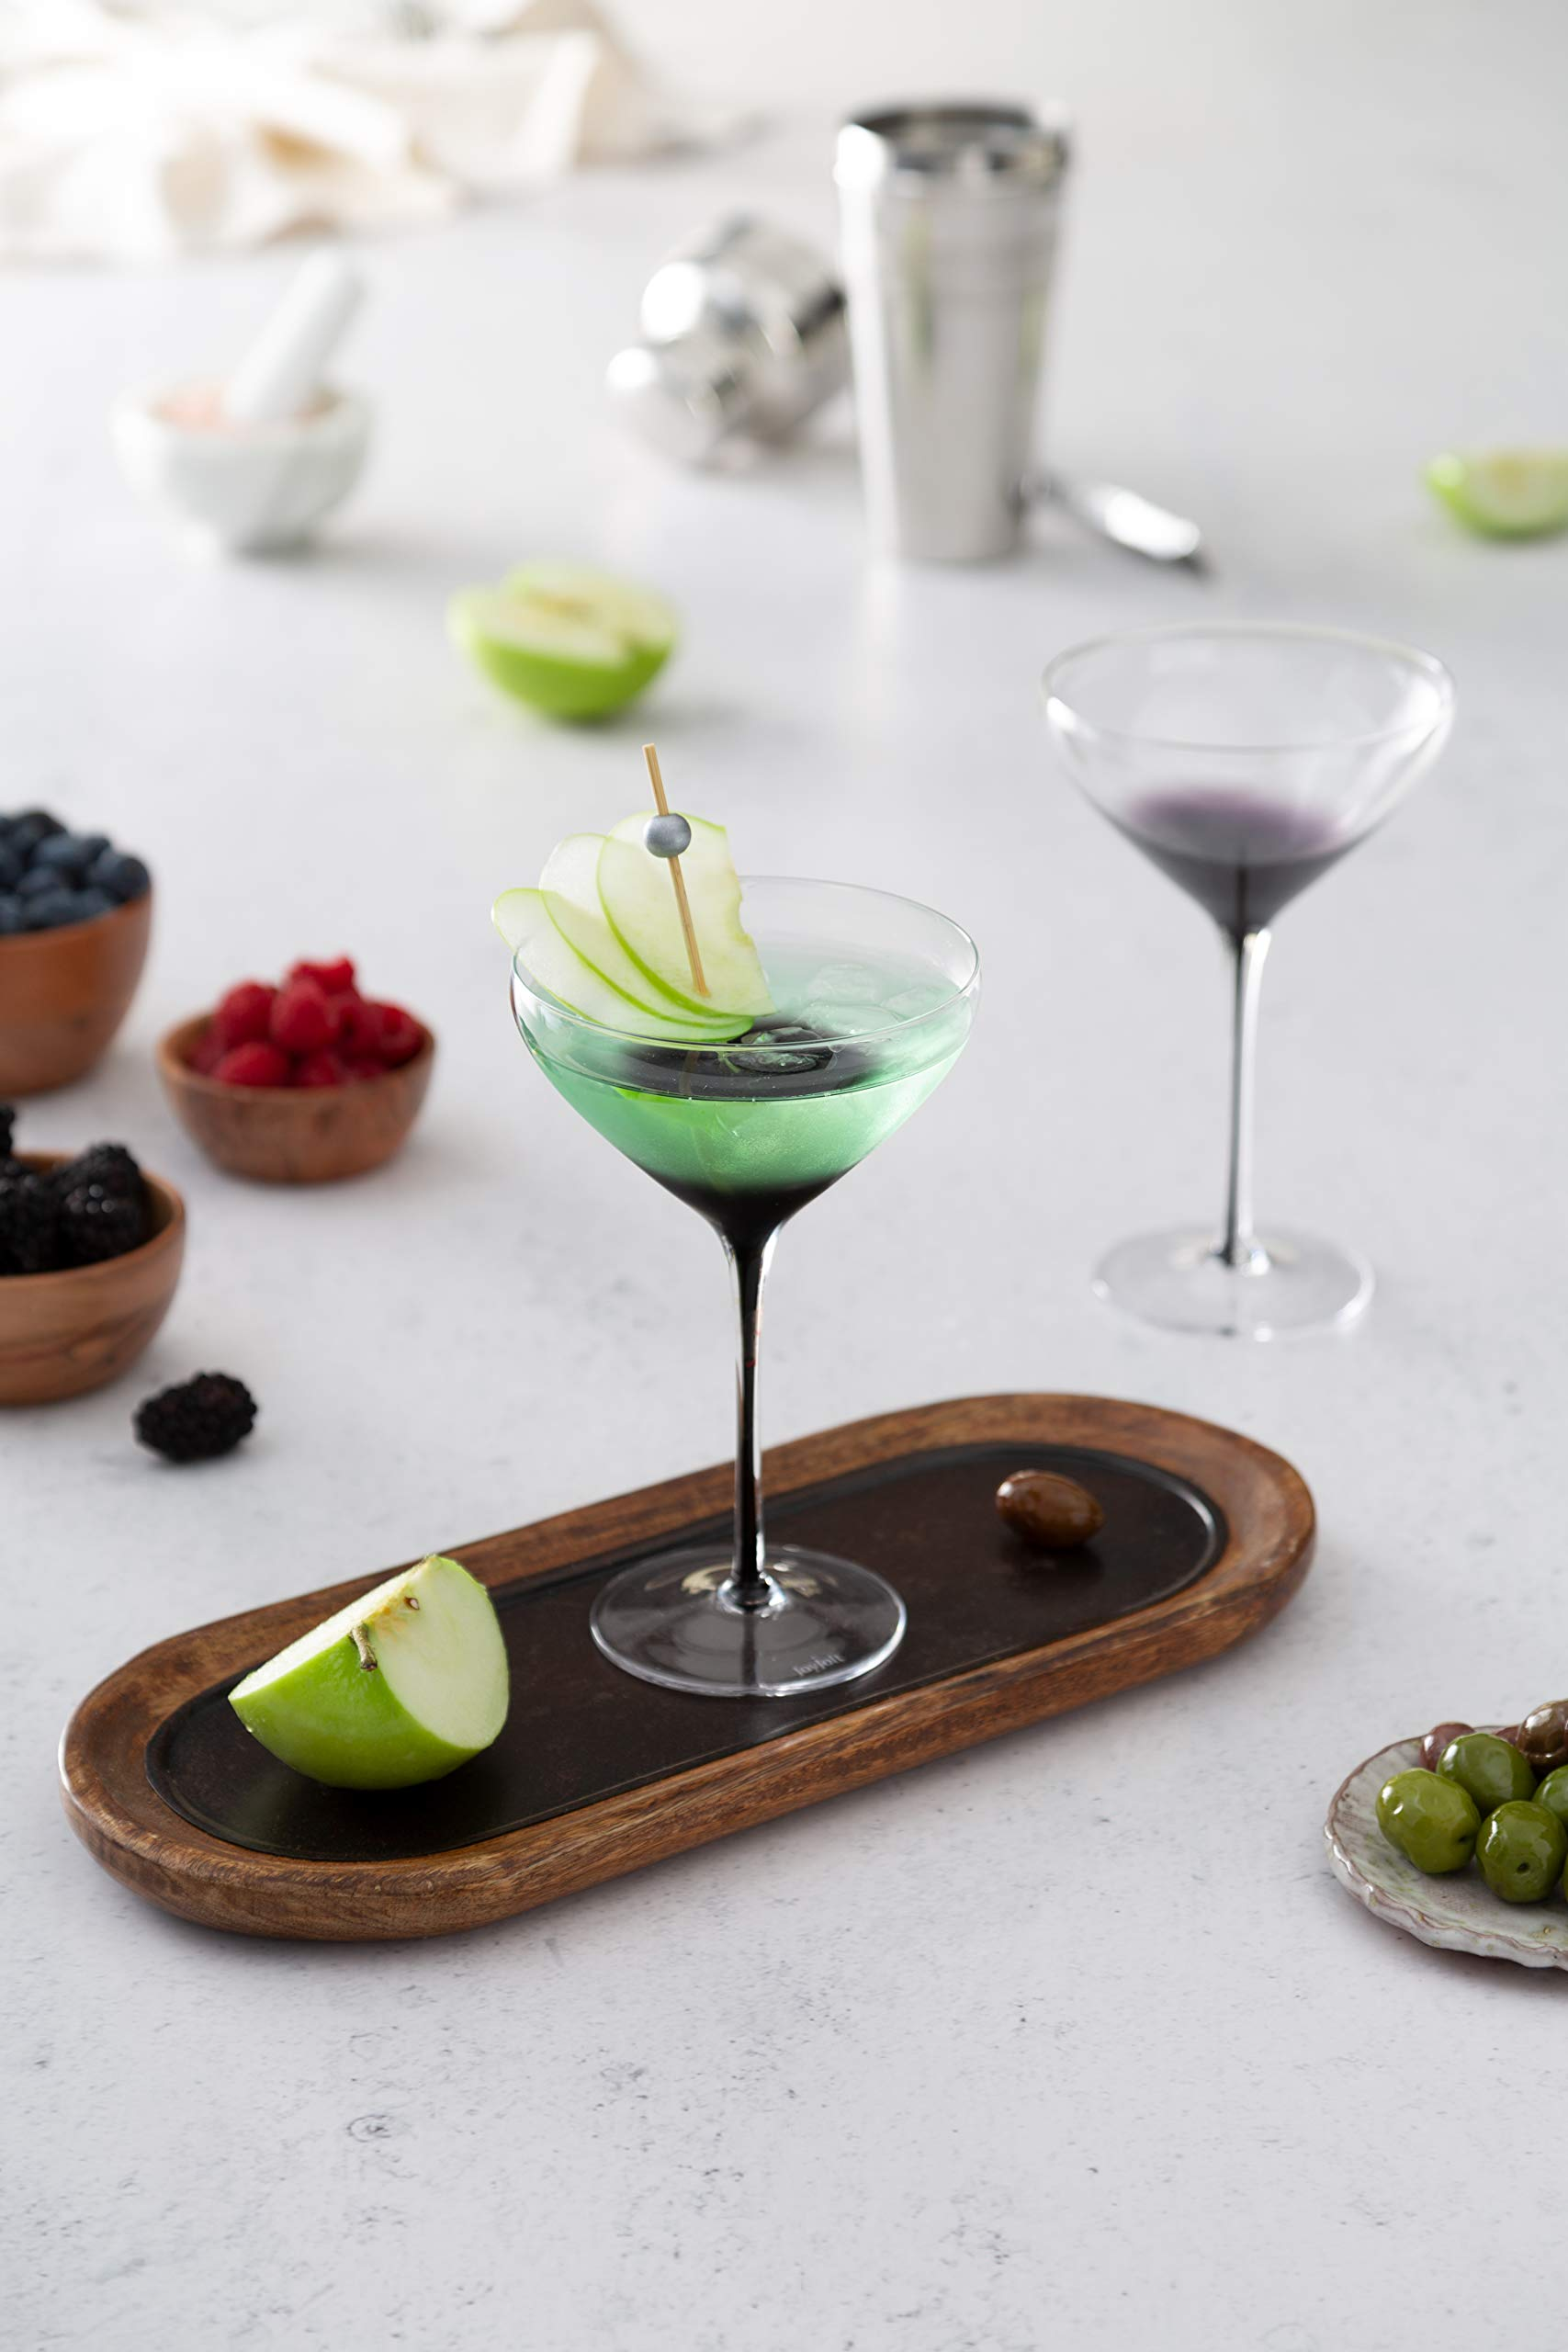 JoyJolt Black Swan Stemmed Martini Glasses, Premium Lead Free Crystal Glassware, 10.5 Oz Capacity, Set Of 2 by JoyJolt (Image #5)